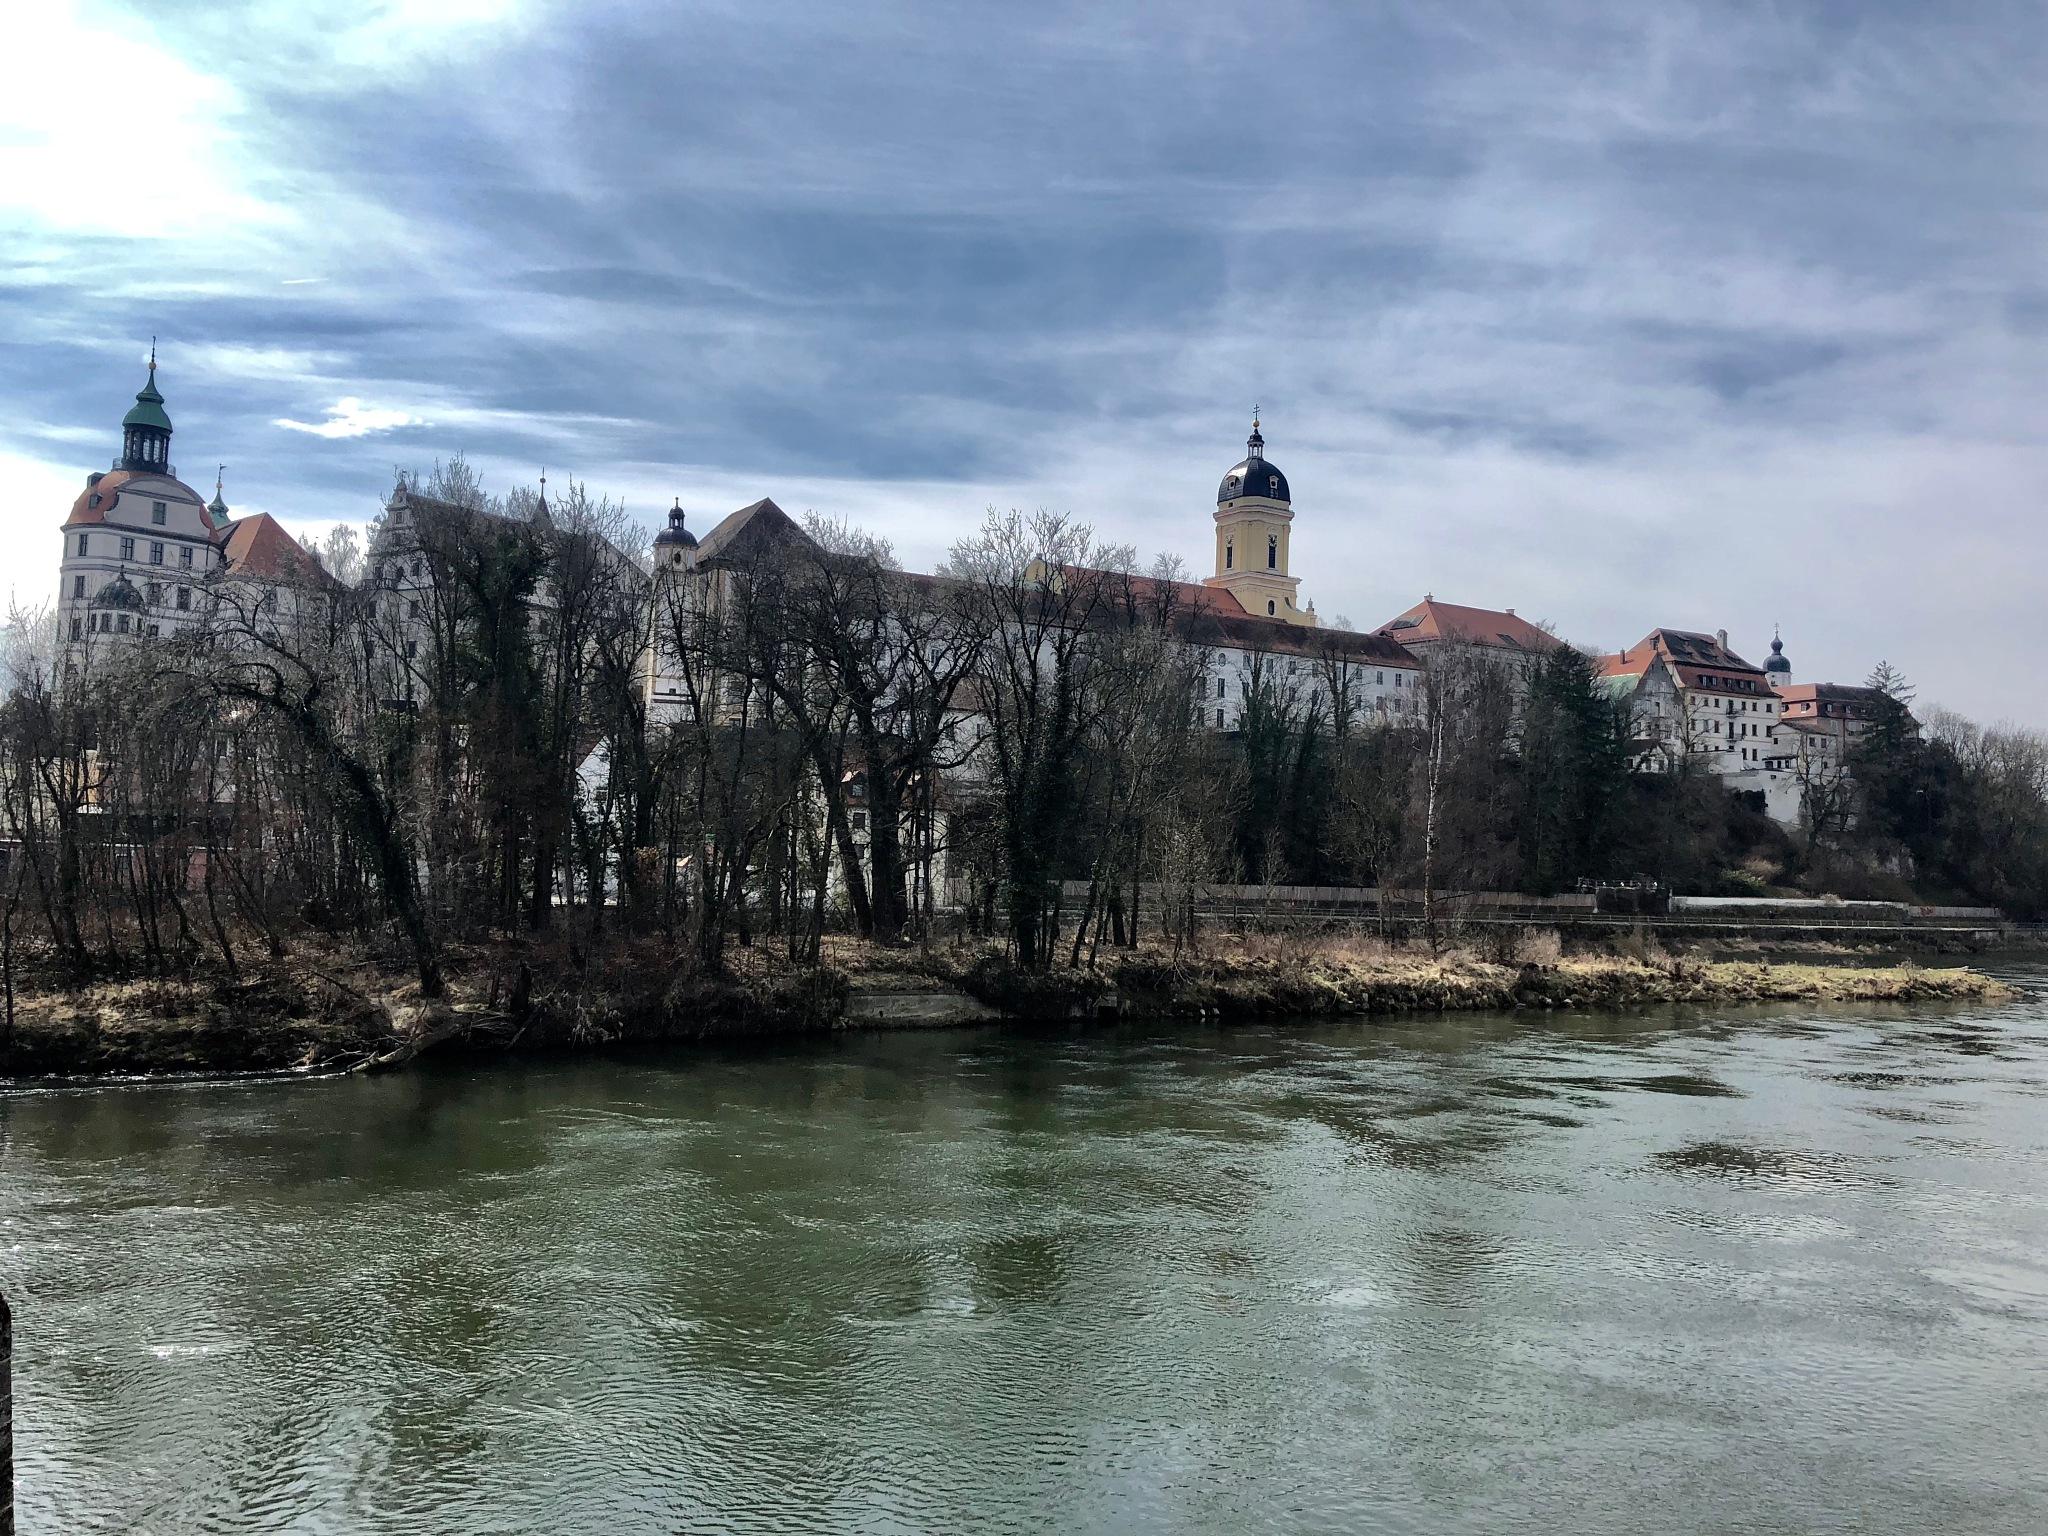 Elisenbrücke, Neuburg an der Donau by Martin Bausewein